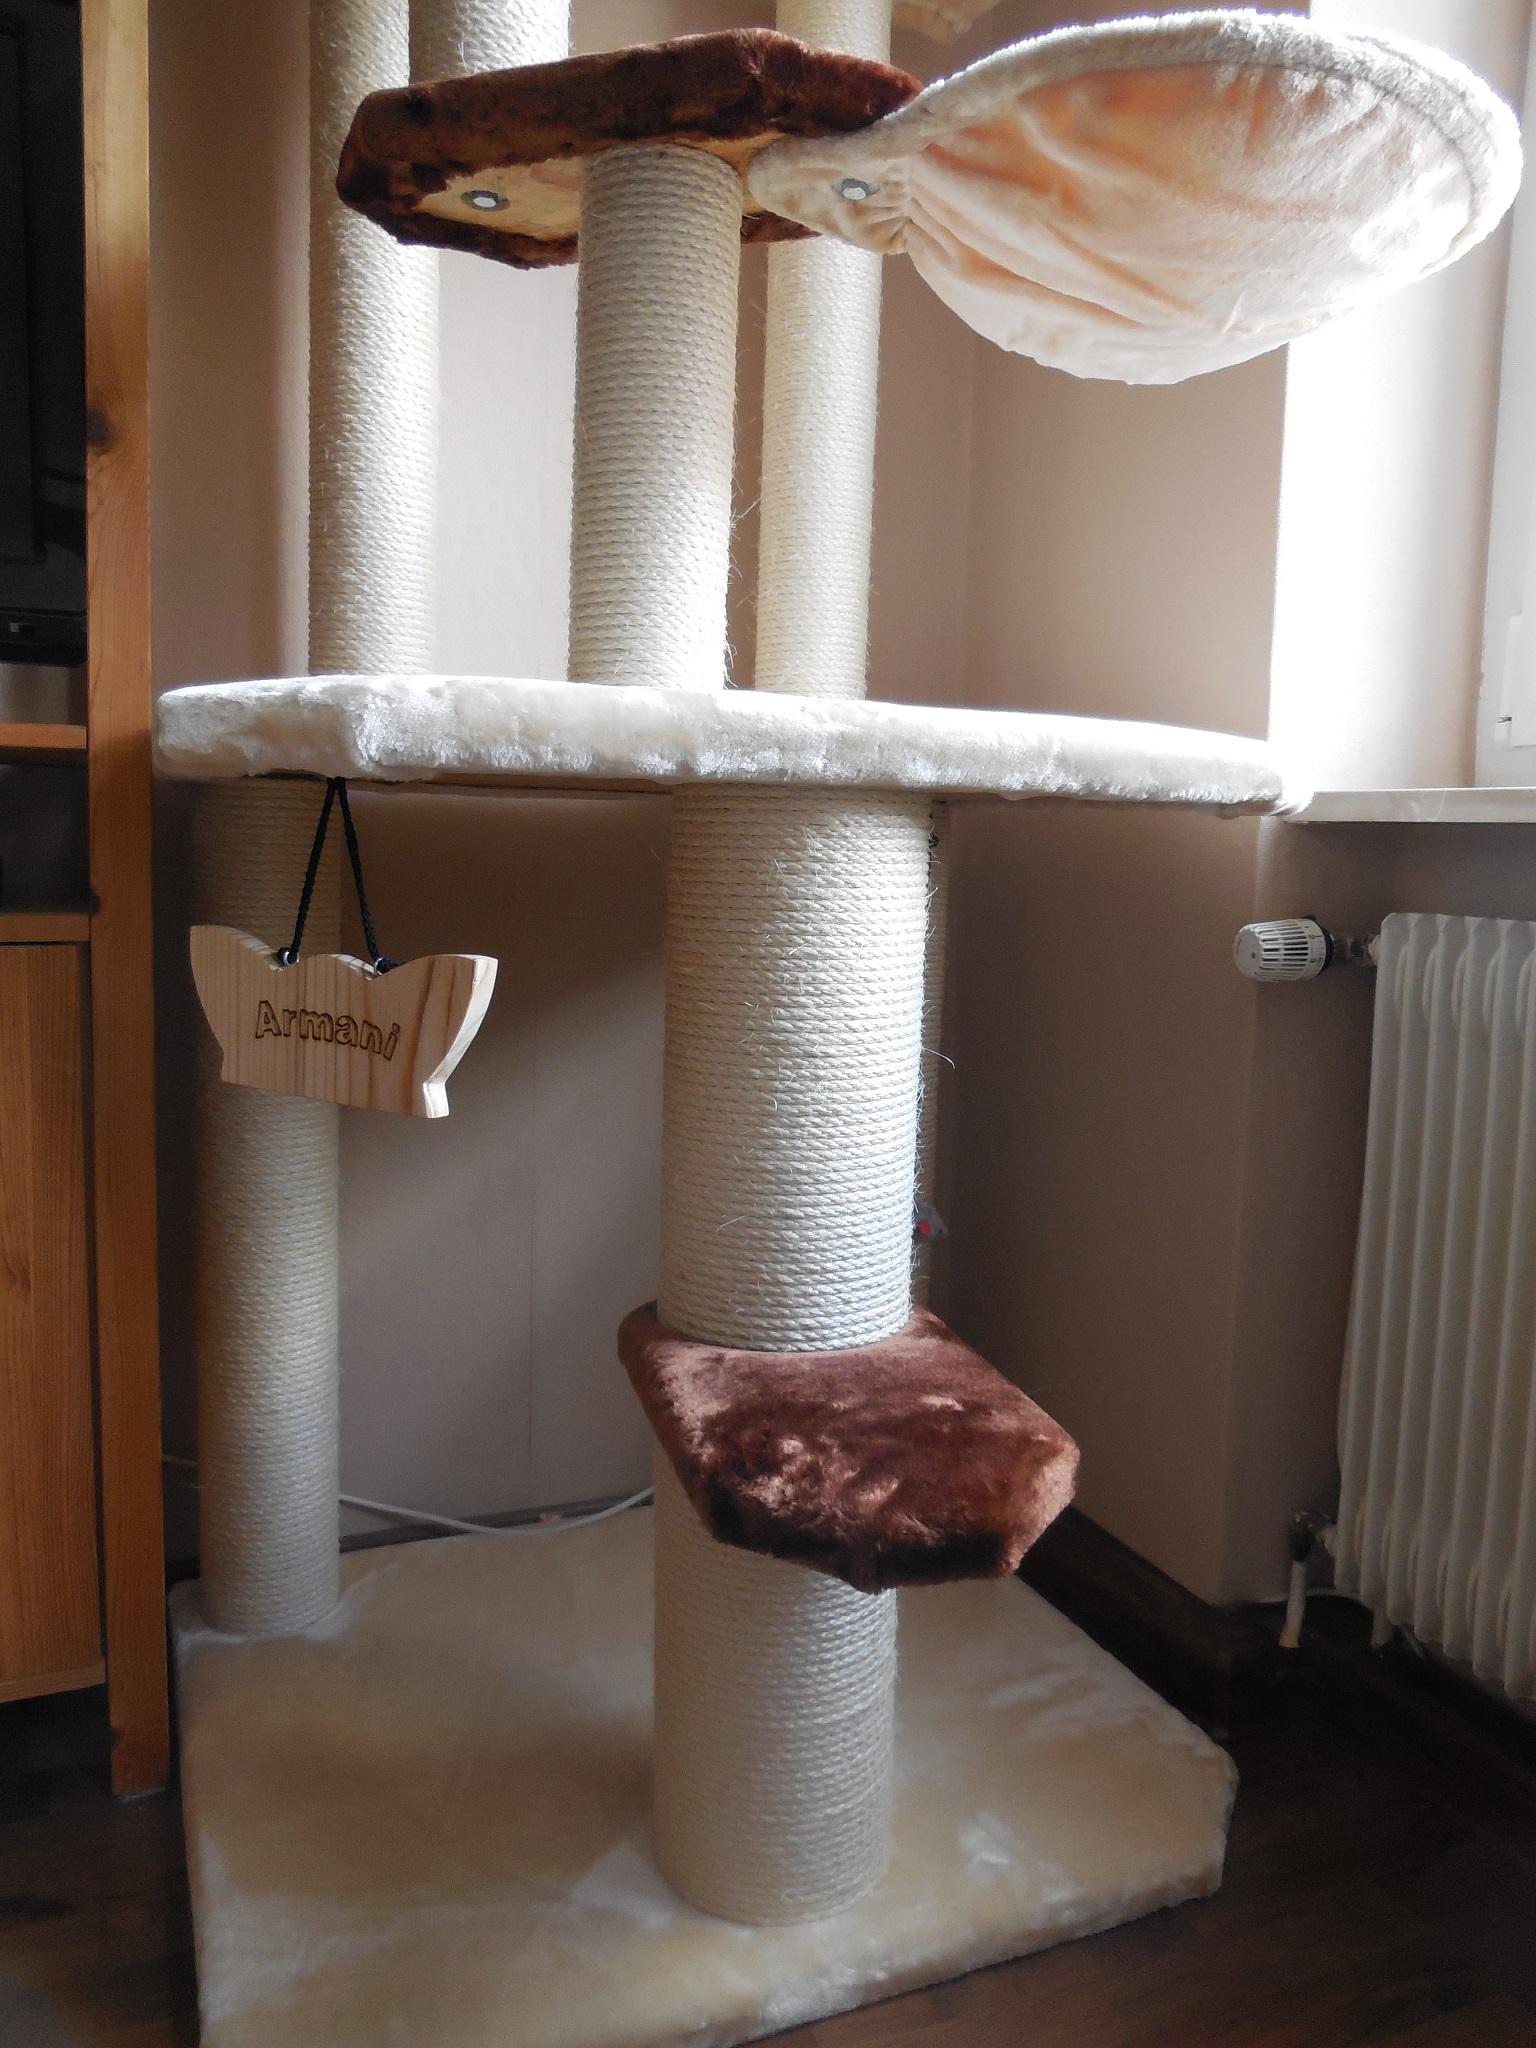 kratzbaum gross armani4. Black Bedroom Furniture Sets. Home Design Ideas